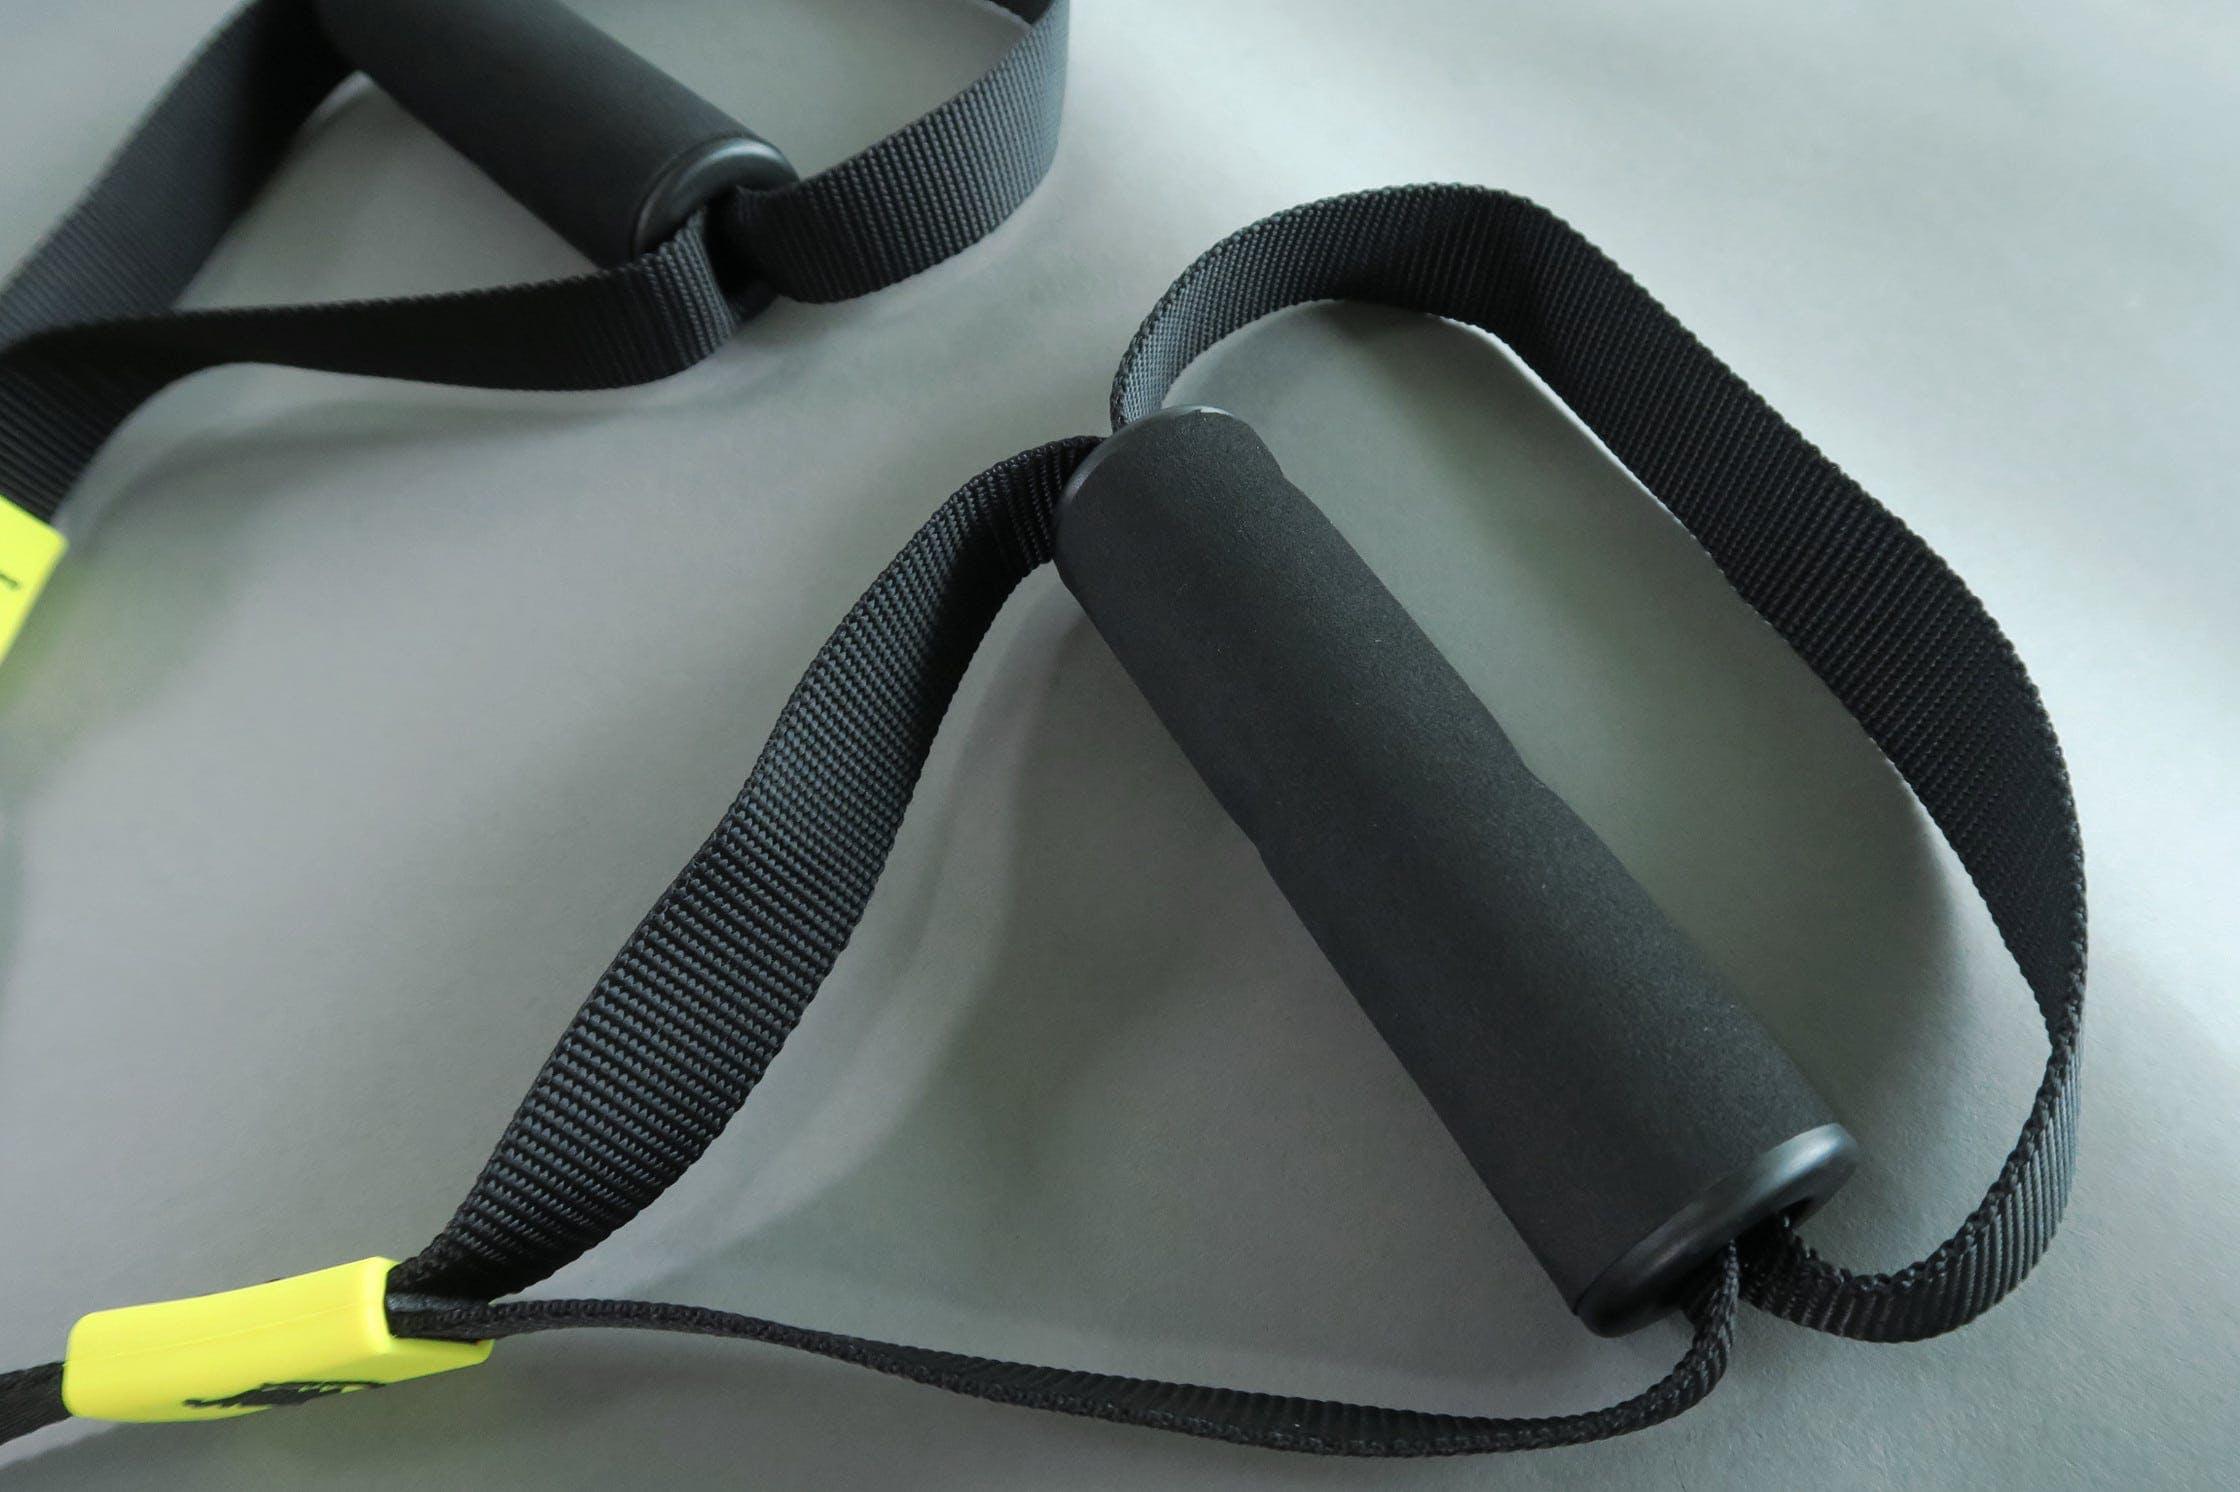 TRX Go Suspension Training Kit Foam Handles